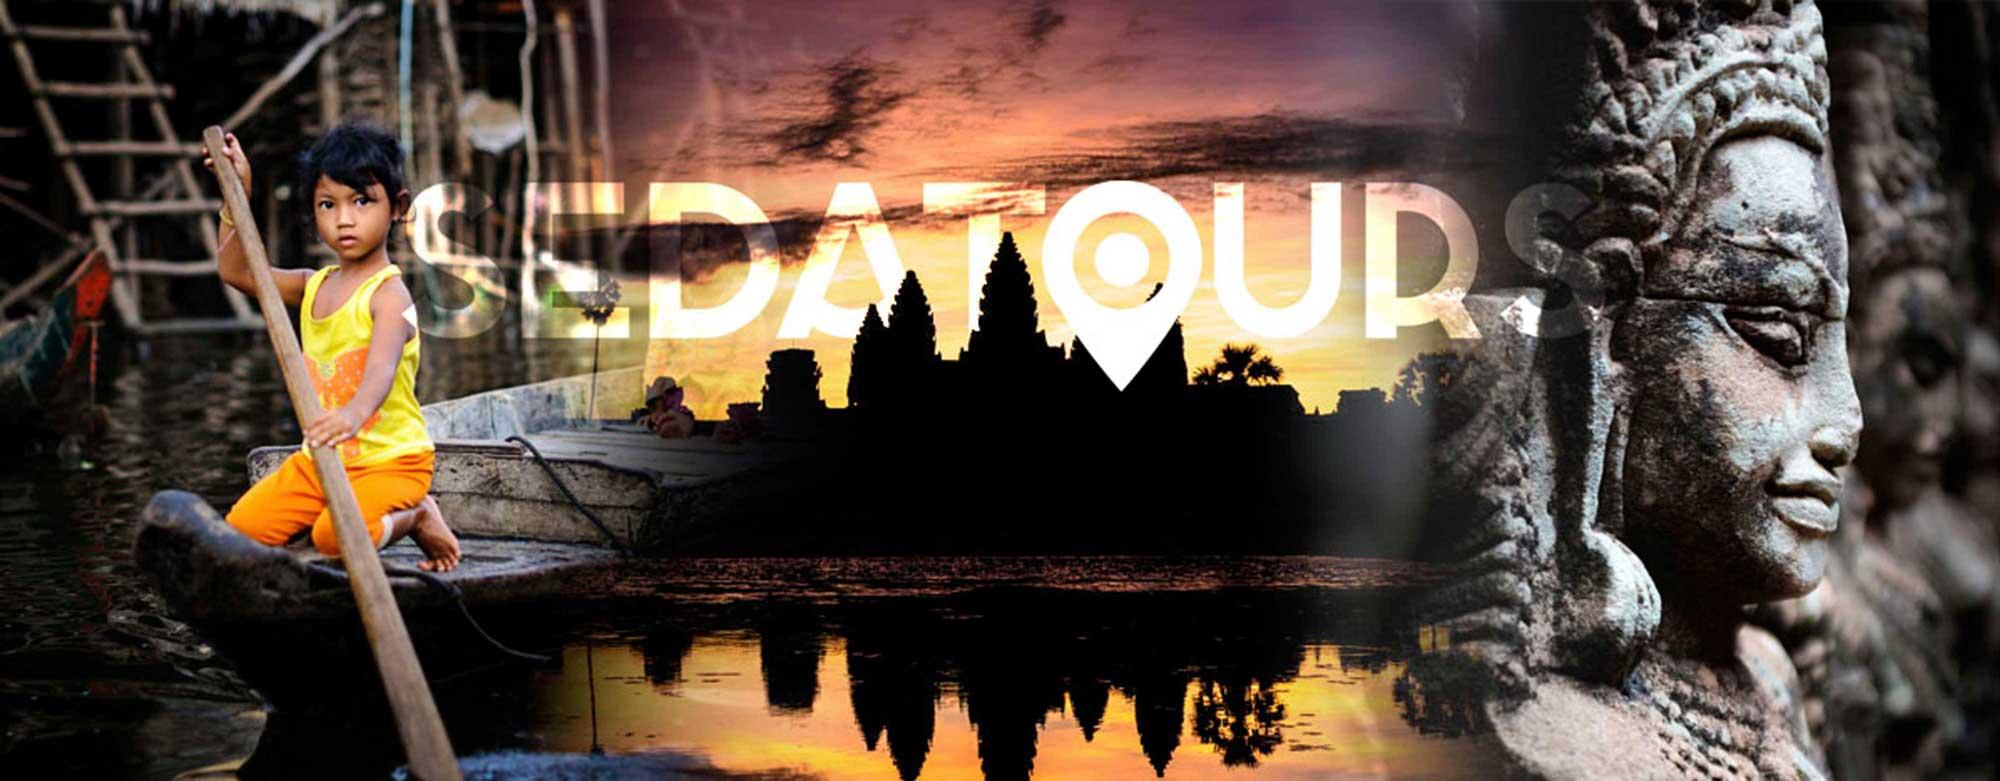 Tu viaje a al sudeste asiático comienza aquí